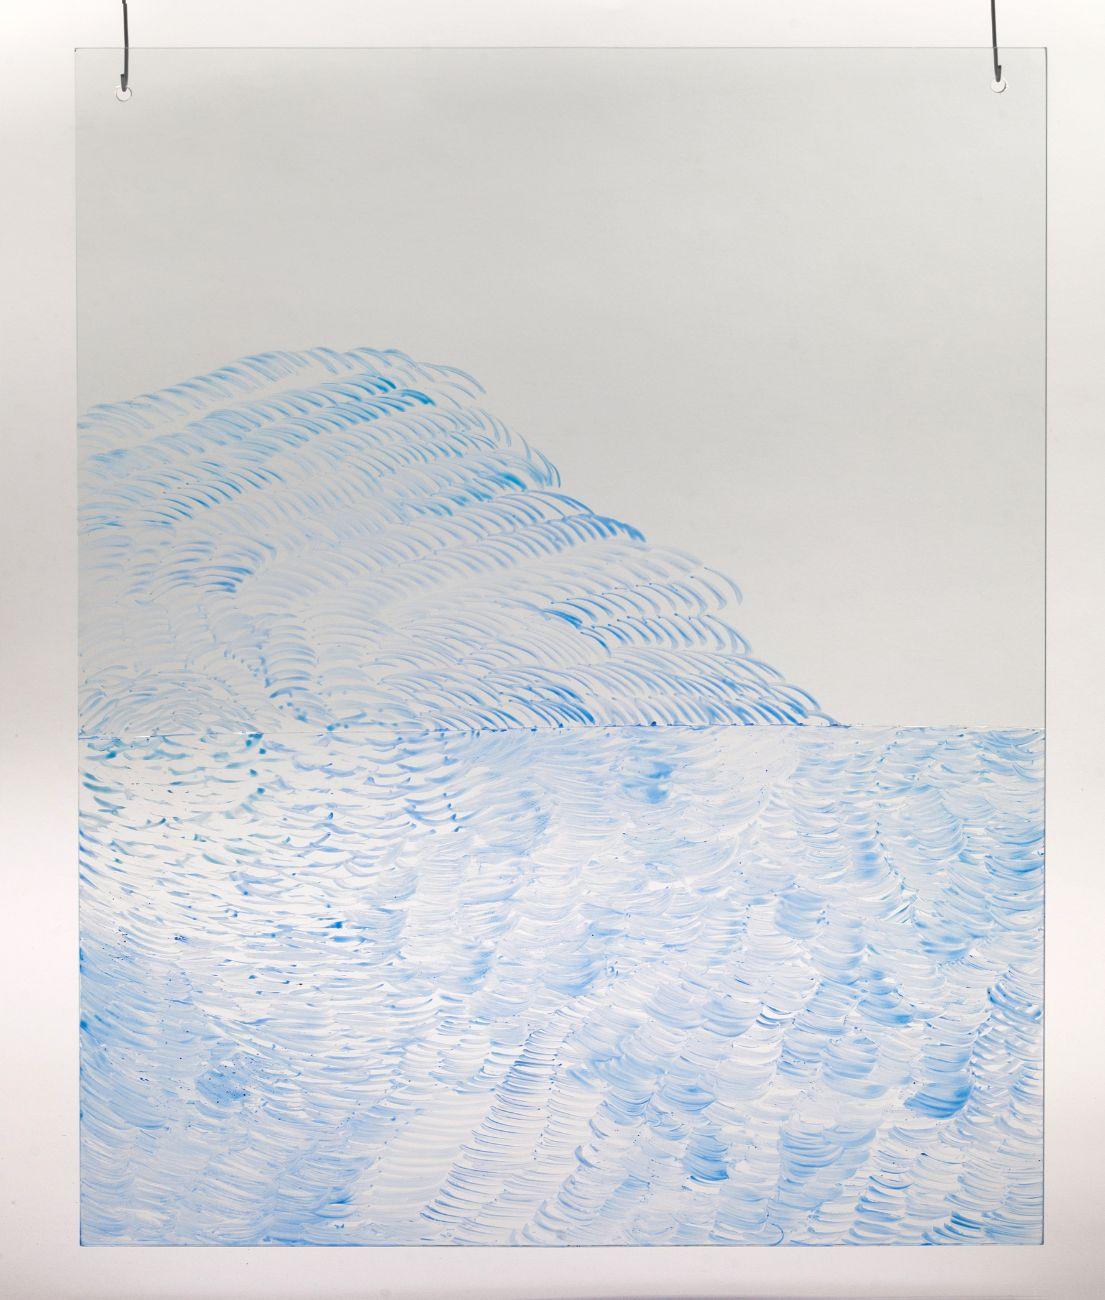 2, 40x50cm, maľba na skle, 2018